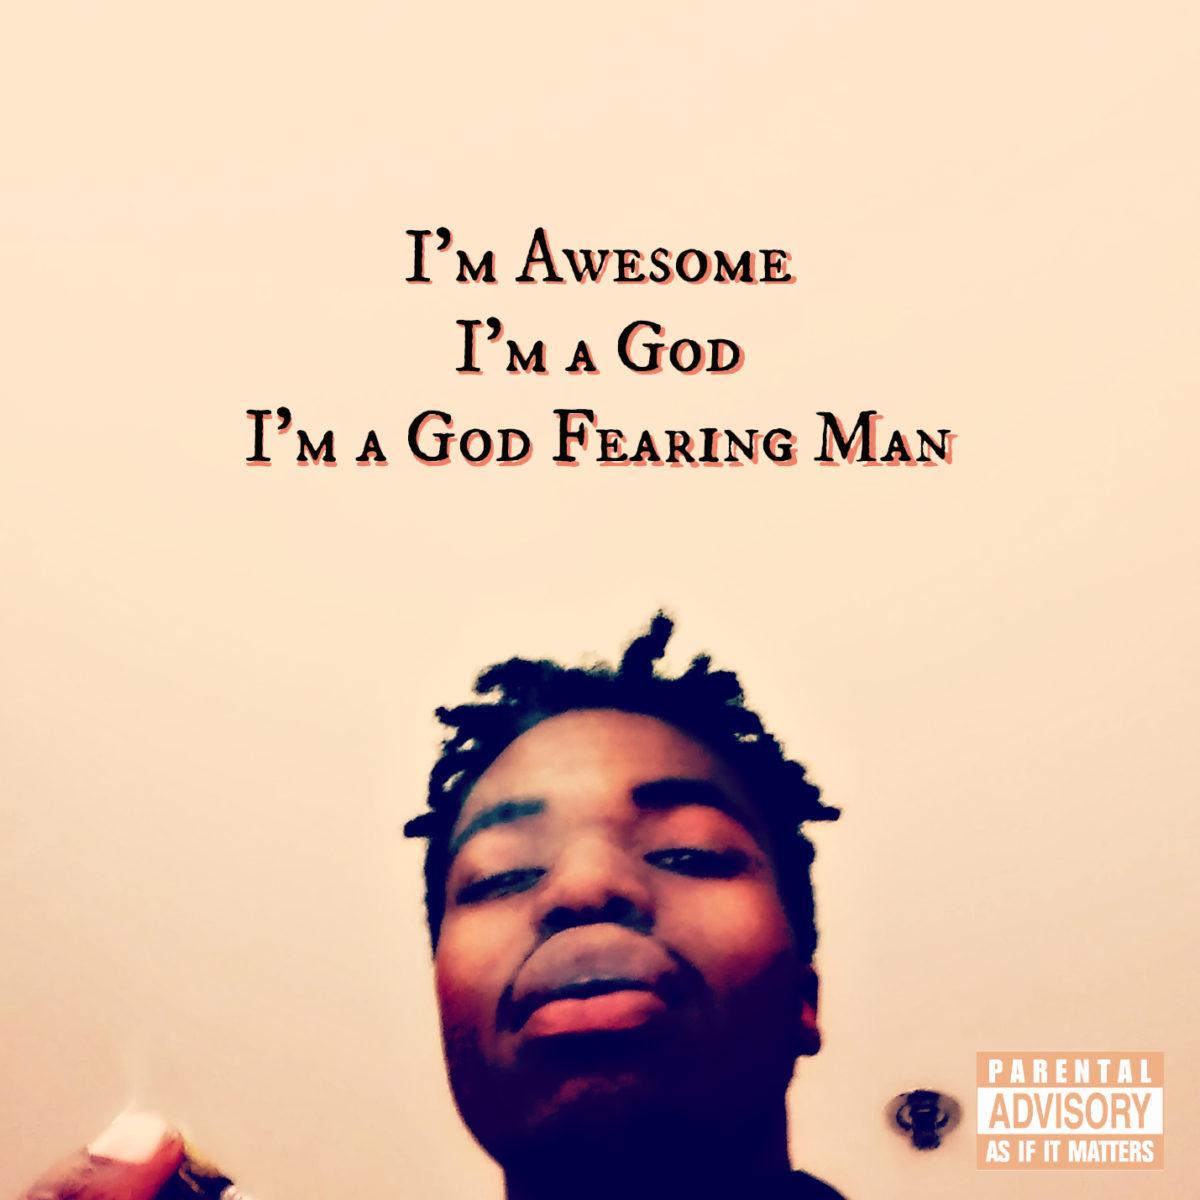 T.R.3 - I'm Awesome, I'm A God, I'm A God Fearing Man (Album Review)